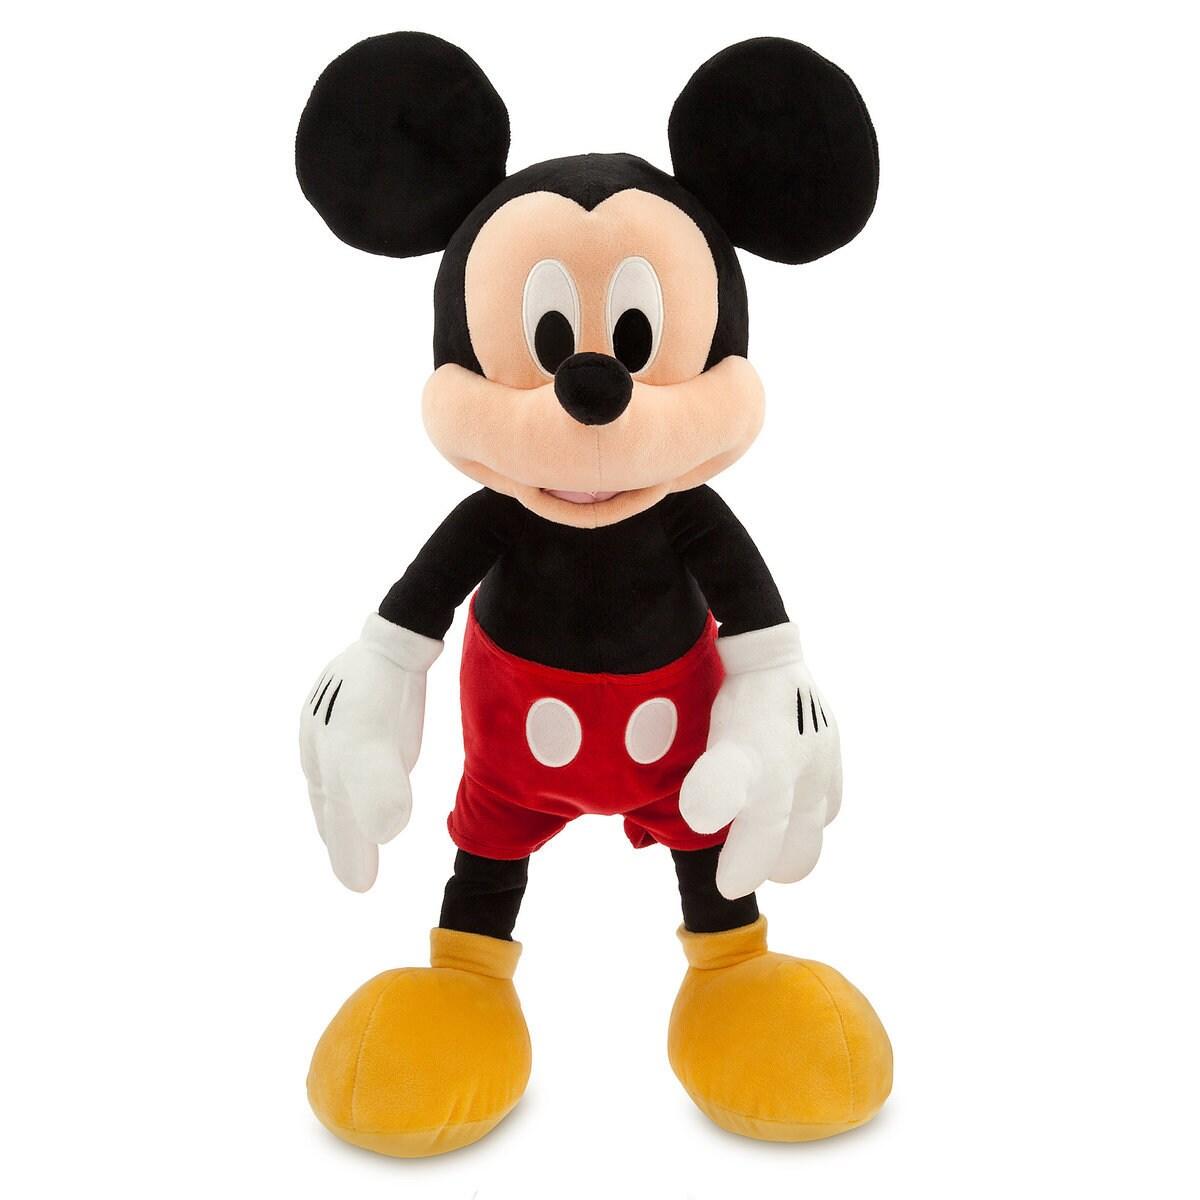 Mickey Mouse Plush - Large | shopDisney